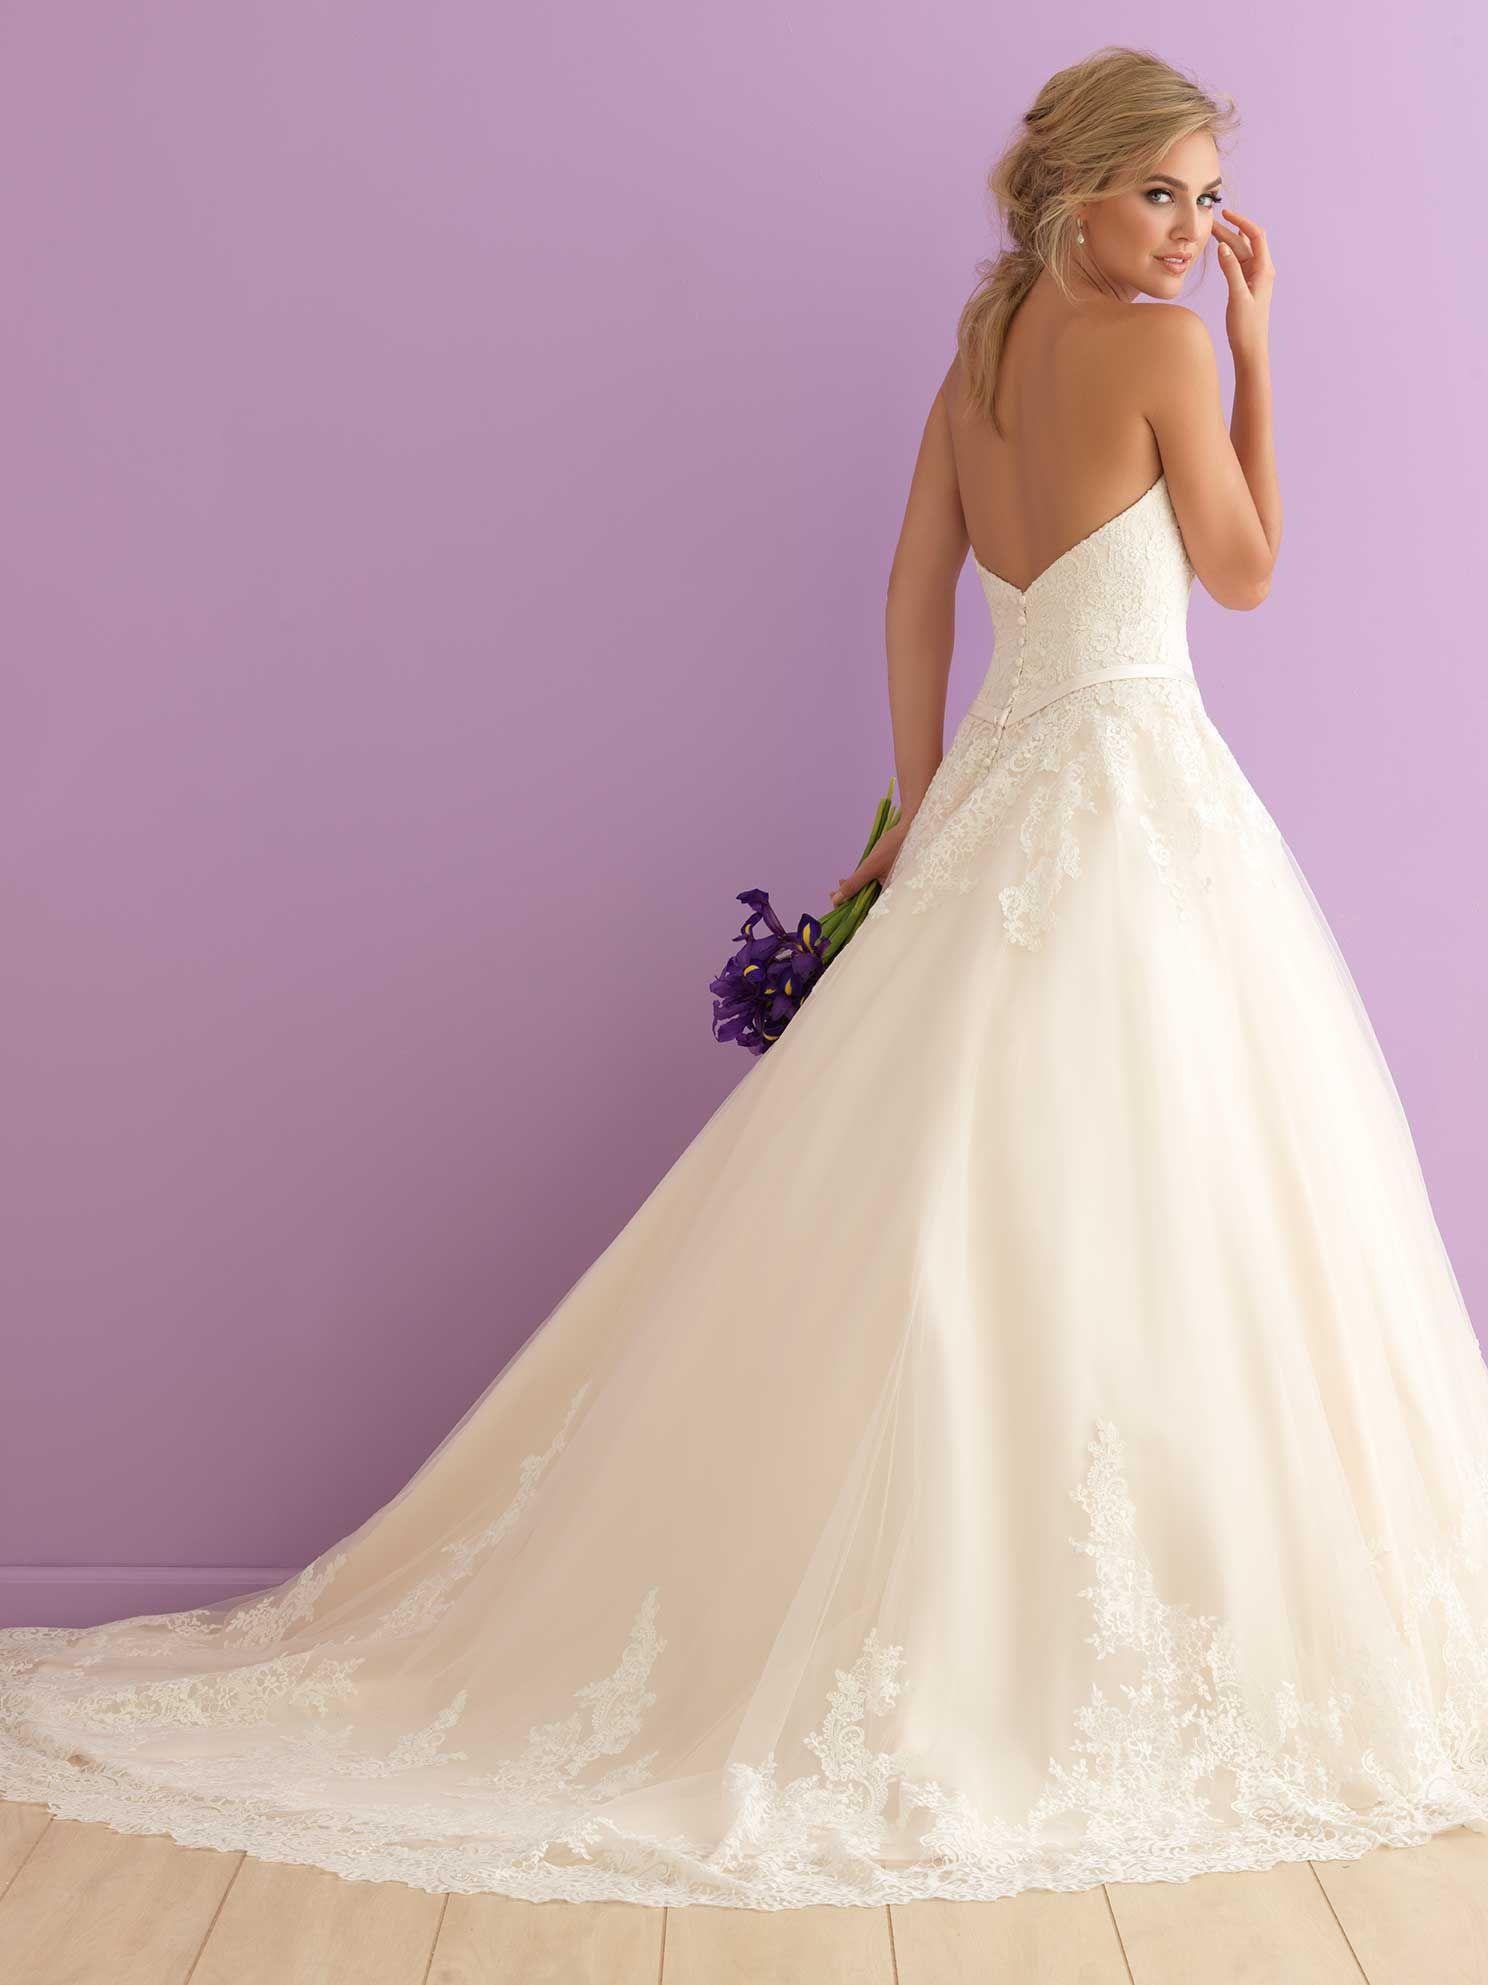 Allure Bridals: Style: 2902 | ALLURE R O M A N C E | Pinterest ...